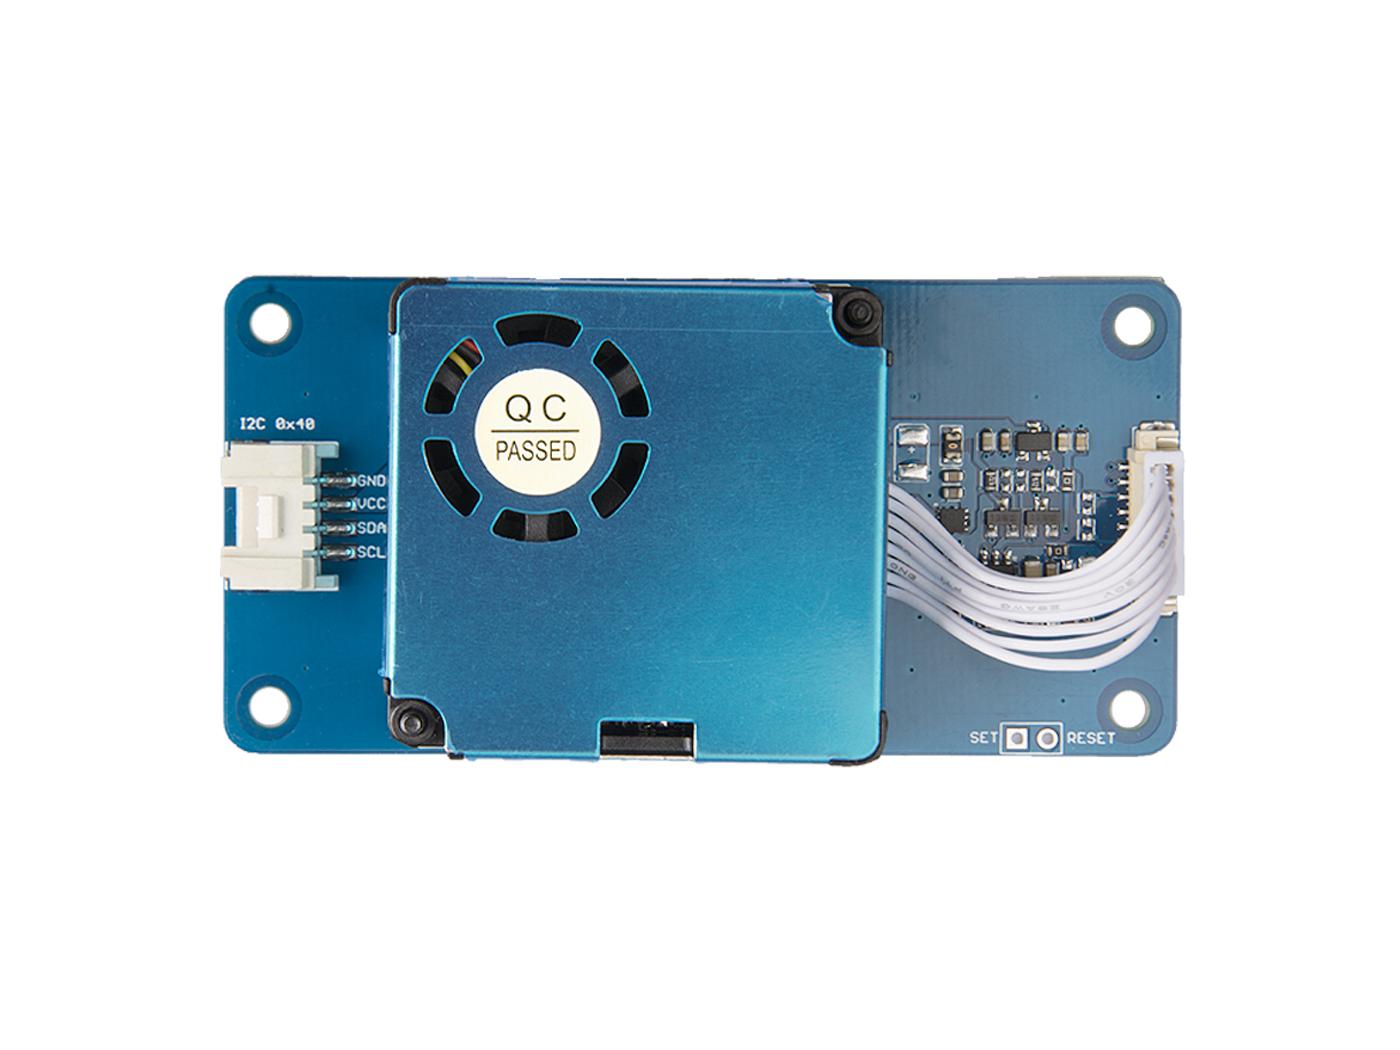 Grove - Laser PM2.5 Sensor (HM3301)